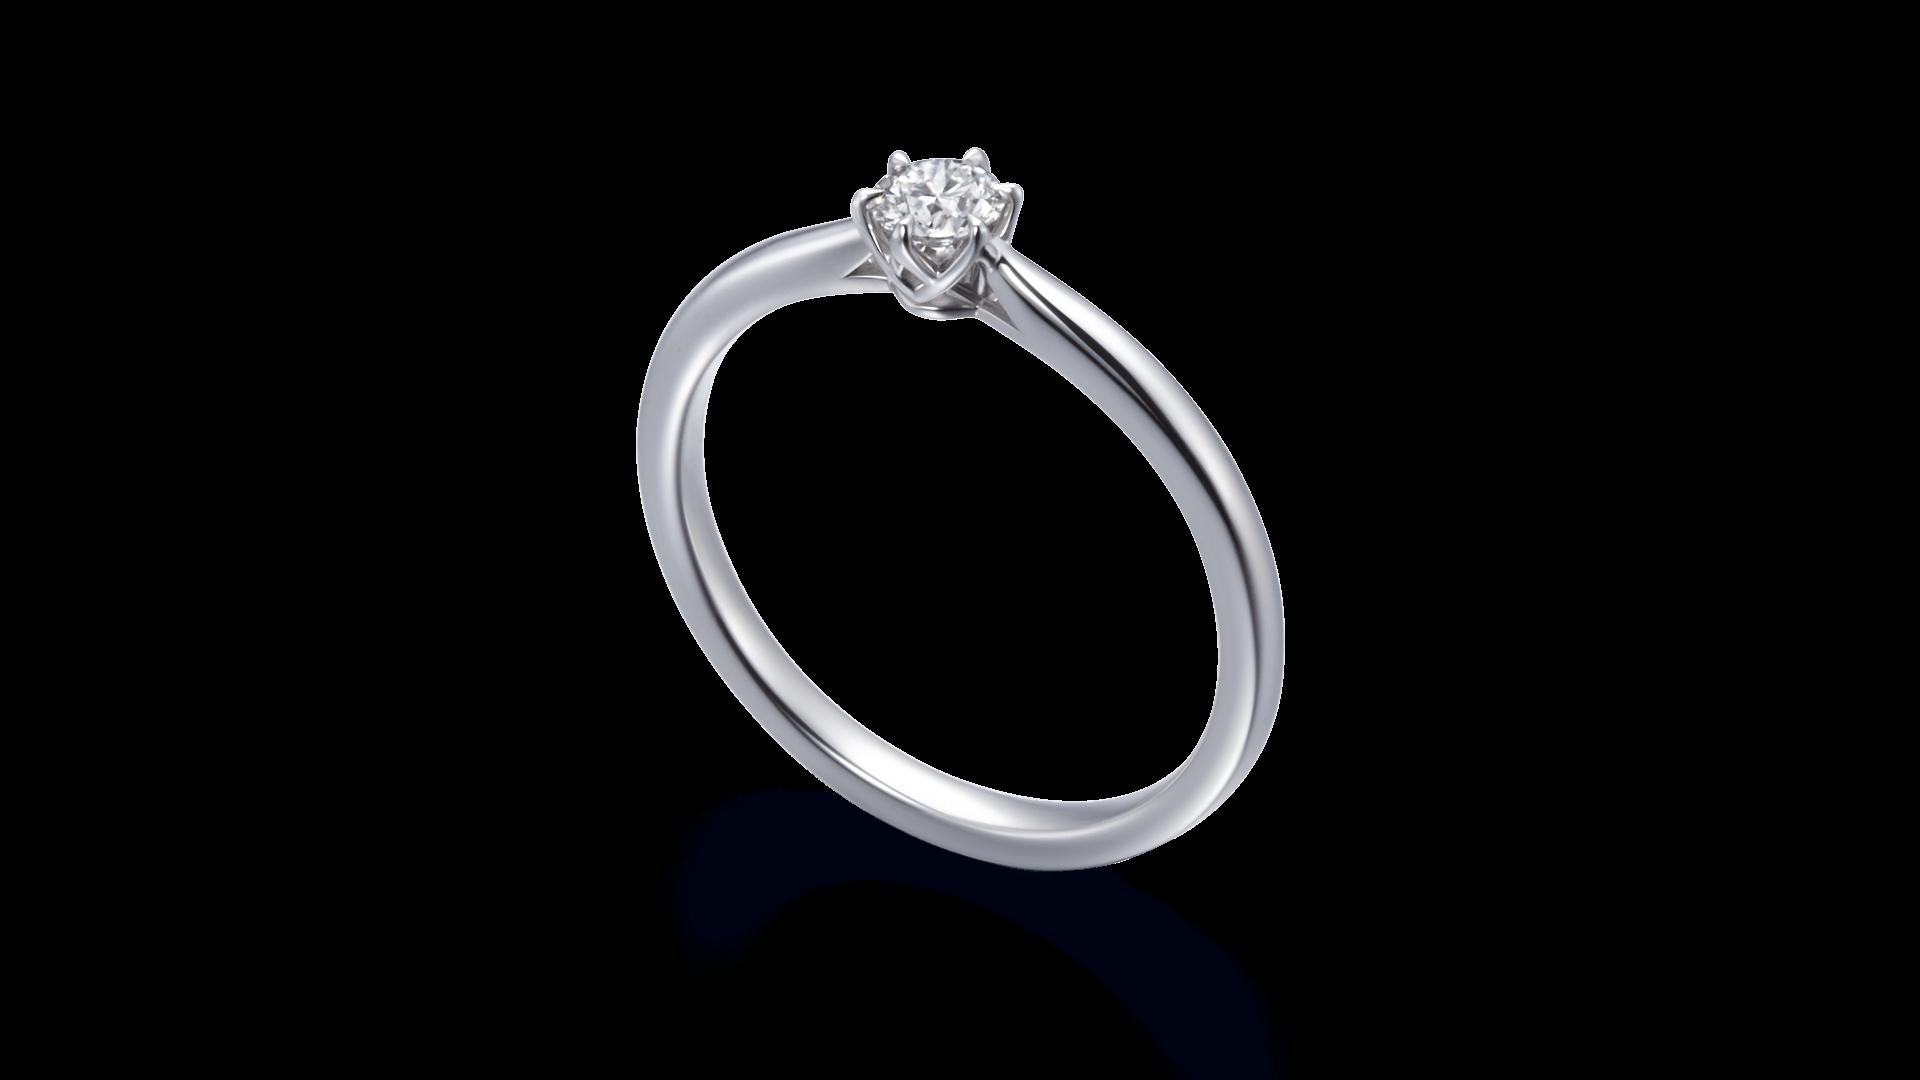 helia ヘリア | 婚約指輪サムネイル 3